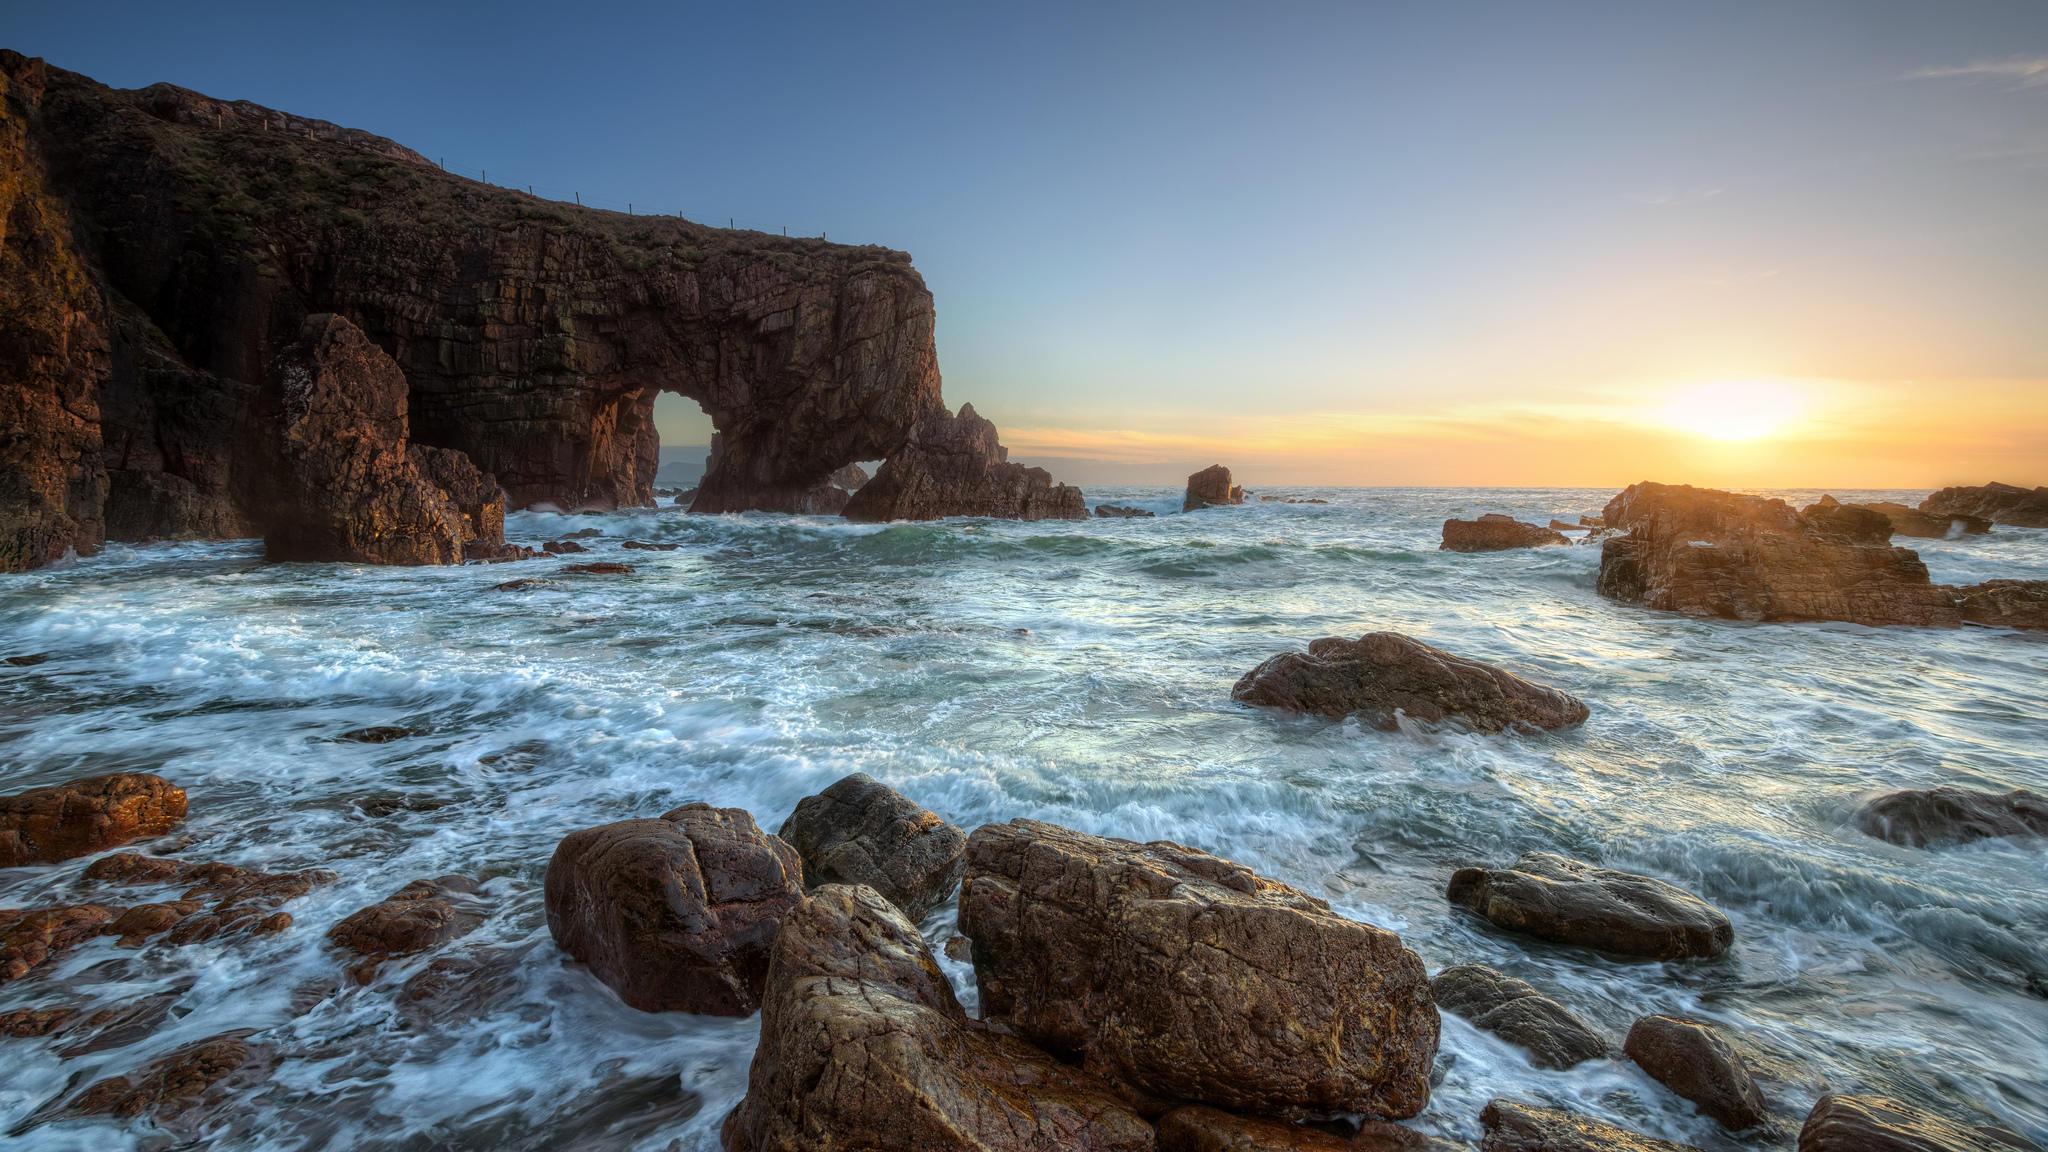 Обои Морская арка, эссекс Донегал, Ирландия, закат